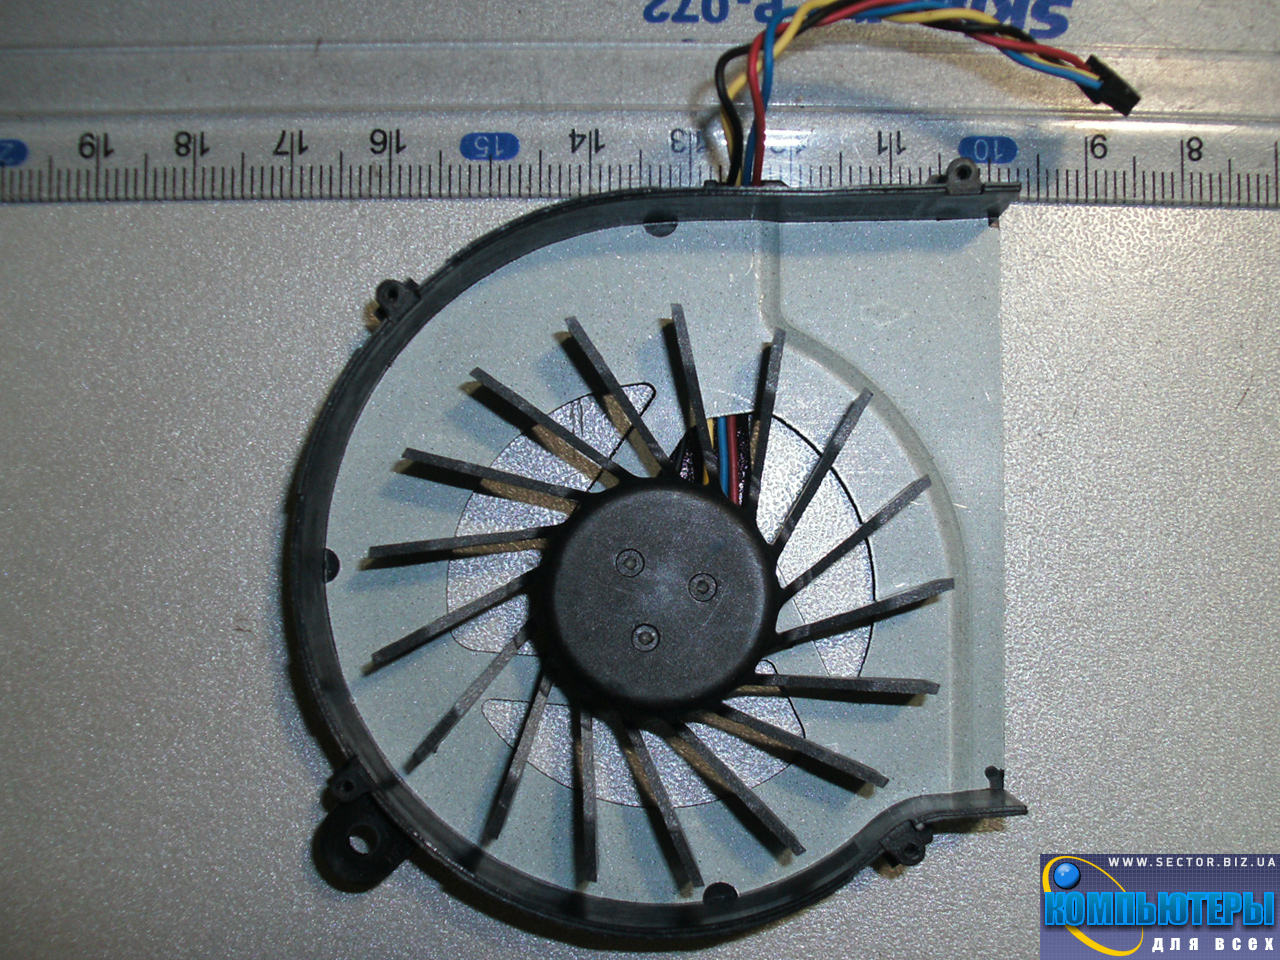 Кулер к ноутбуку HP Compaq CQ42 G42 G4 G6 G7 CQ56 G56 p/n: MF75120V1-C050-S9A. Фото № 2.